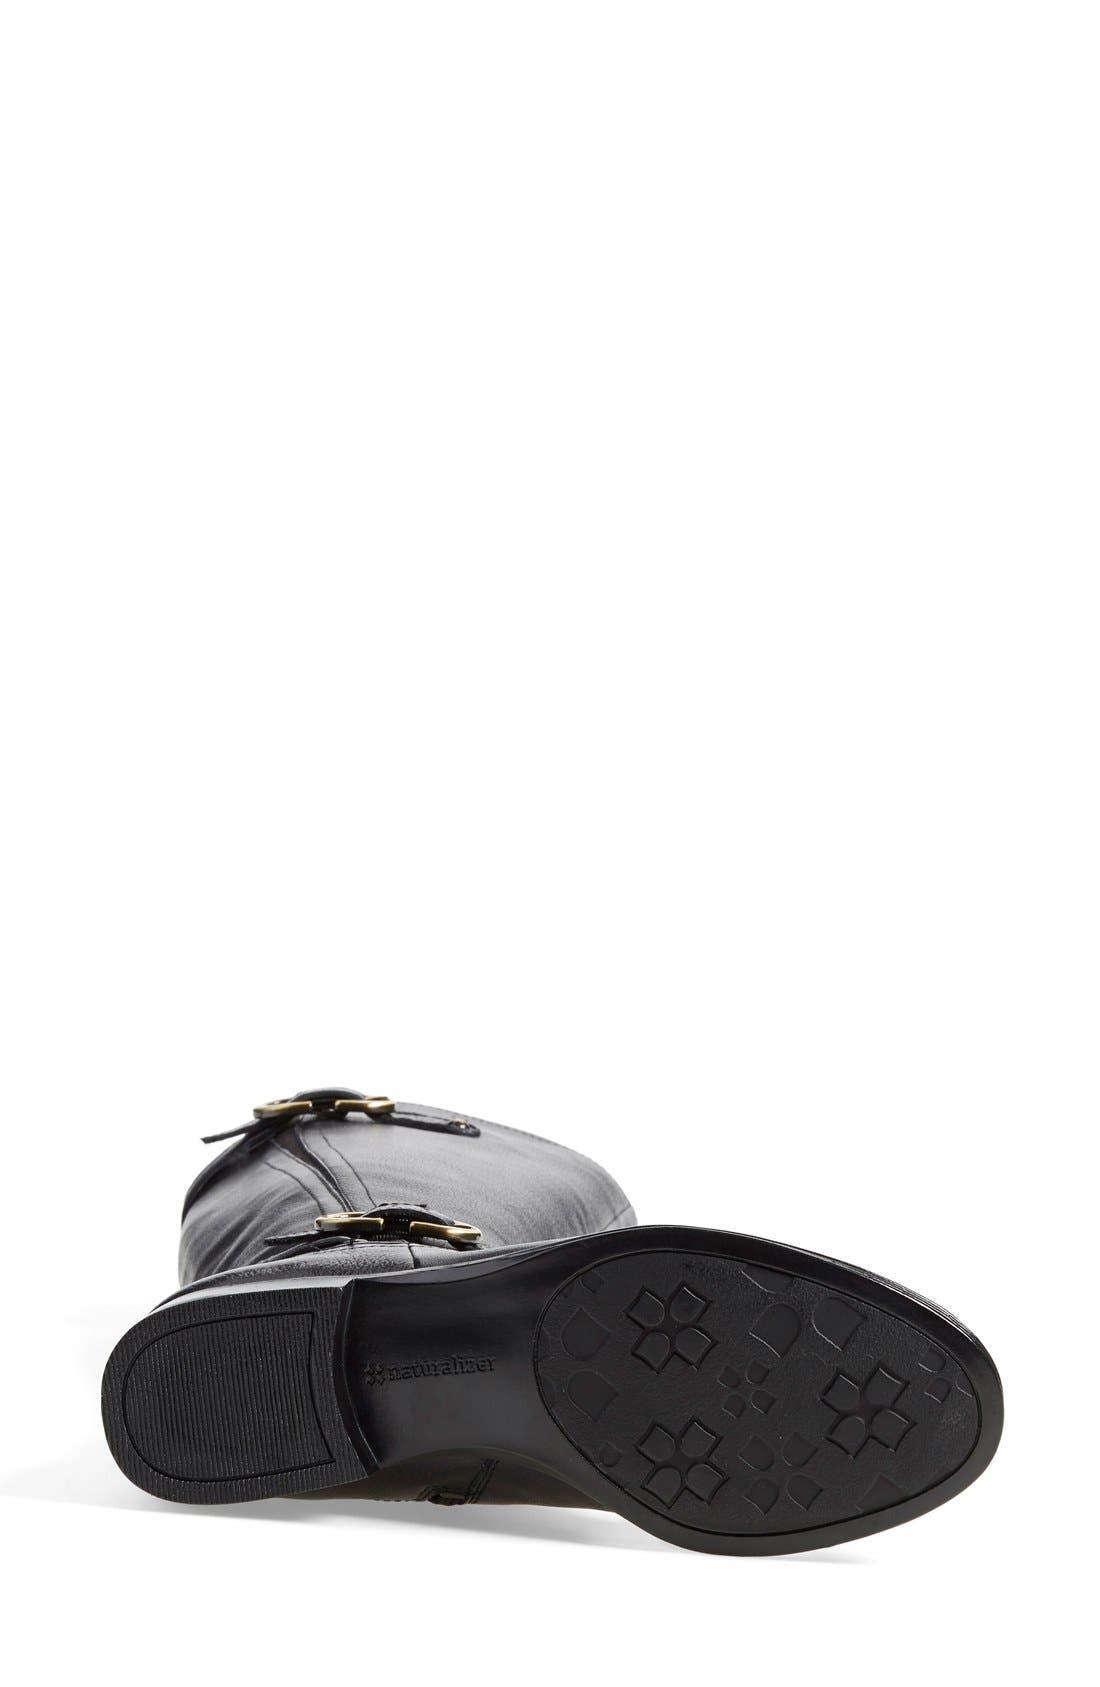 'Jennings' Knee High Boot,                             Alternate thumbnail 4, color,                             Black Leather